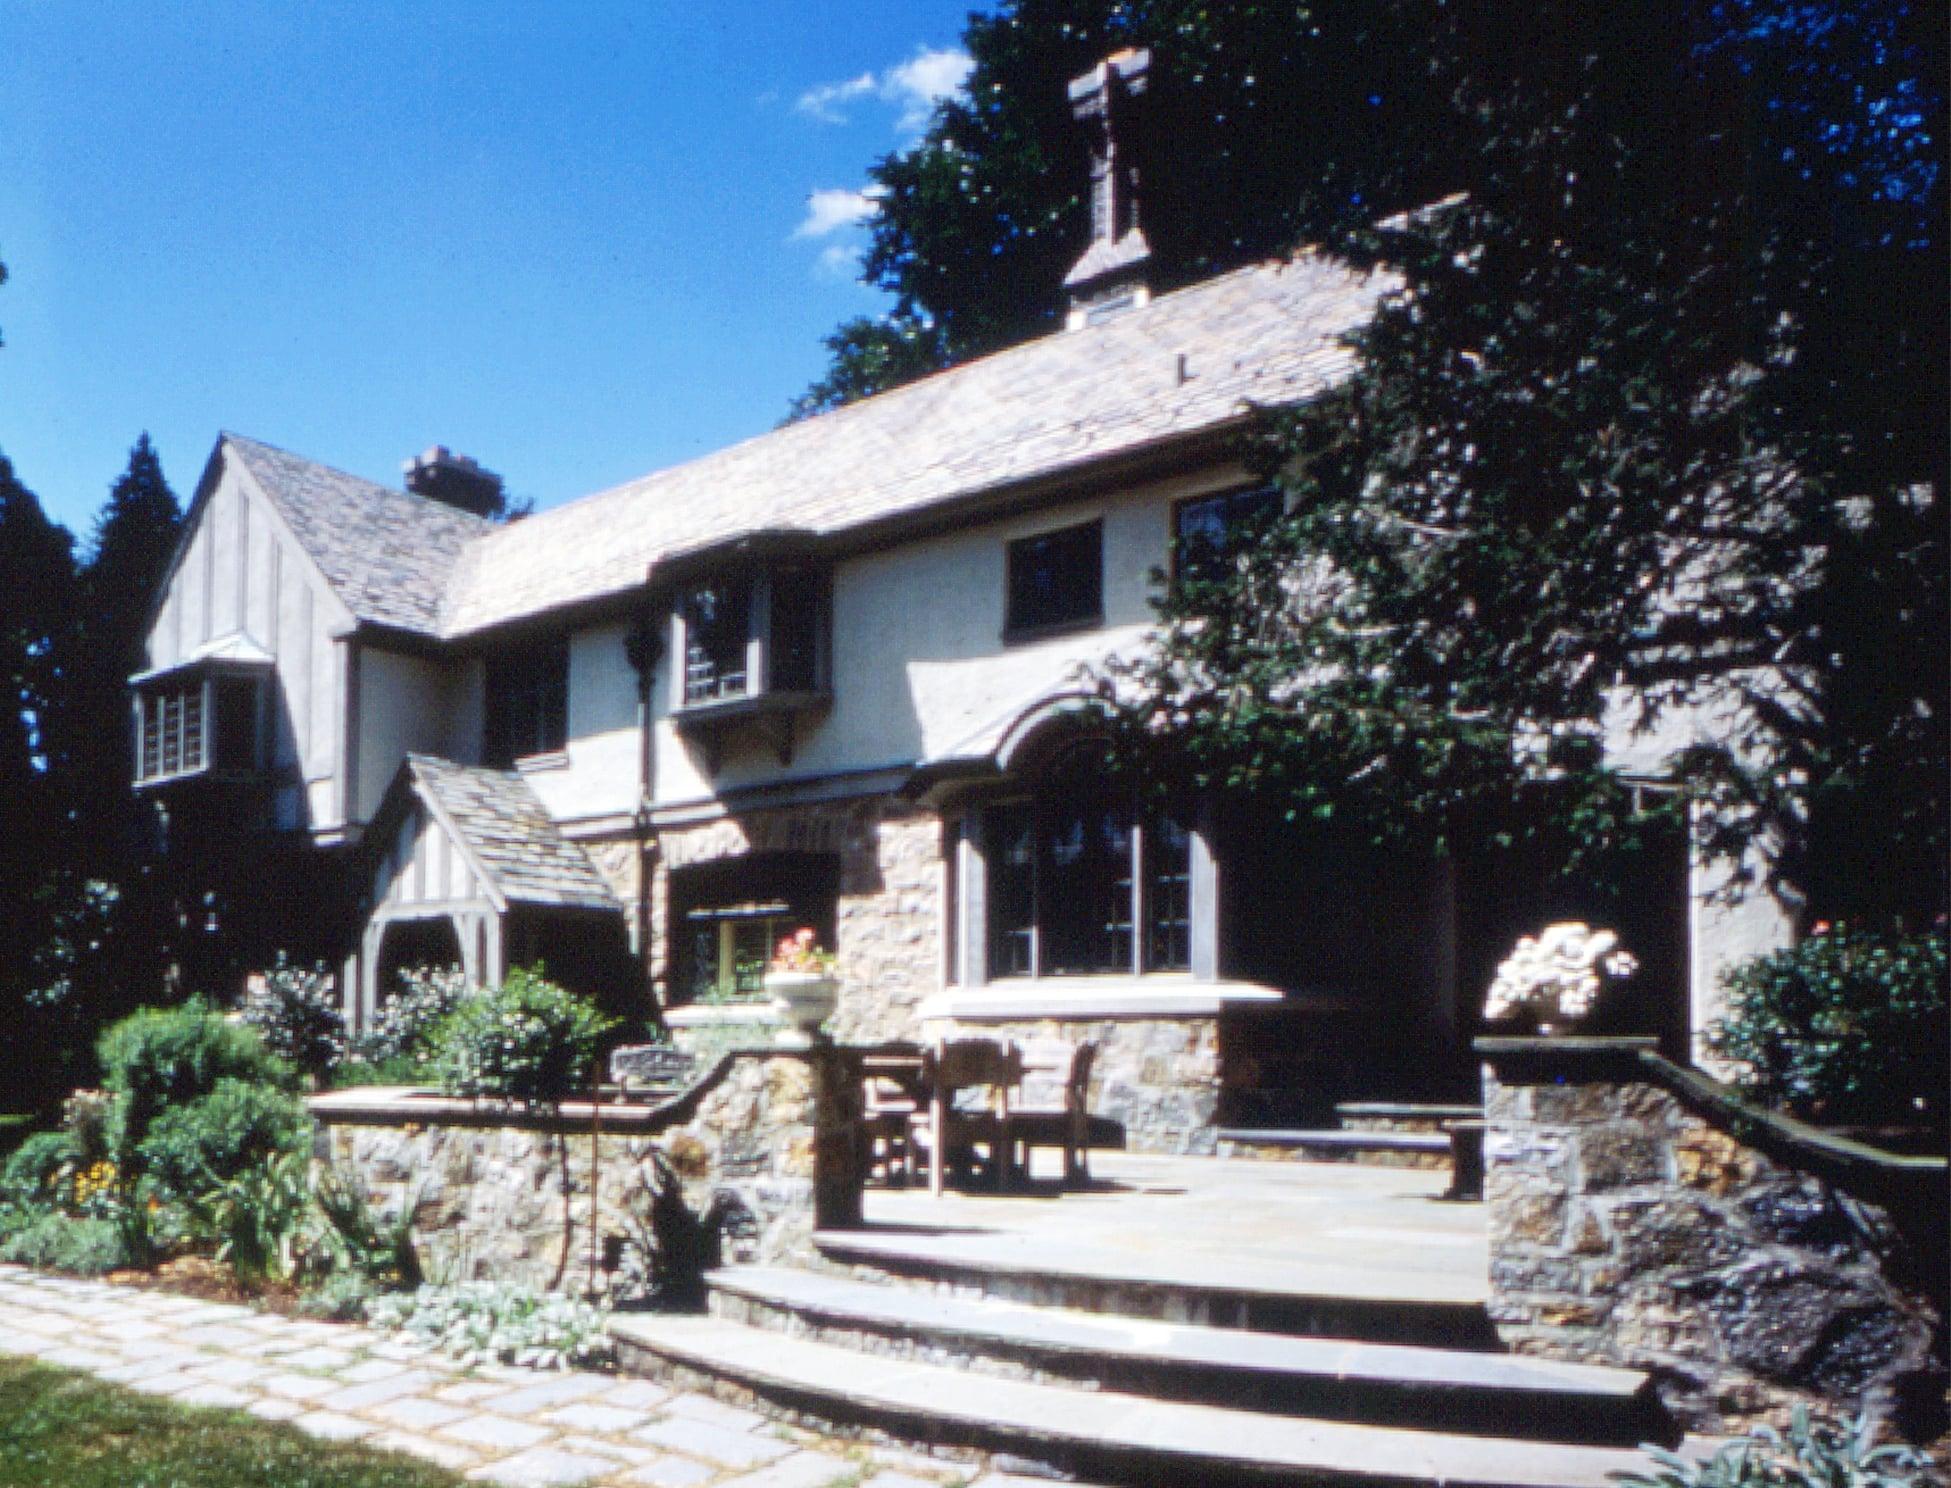 New_Canaan.Connecticut.Forbes.Robert_Orr_&_Associates.Architecture.Landscape_Architecture.New_Urbanism.Cornish.Rear_Terrace_Oblique.jpg